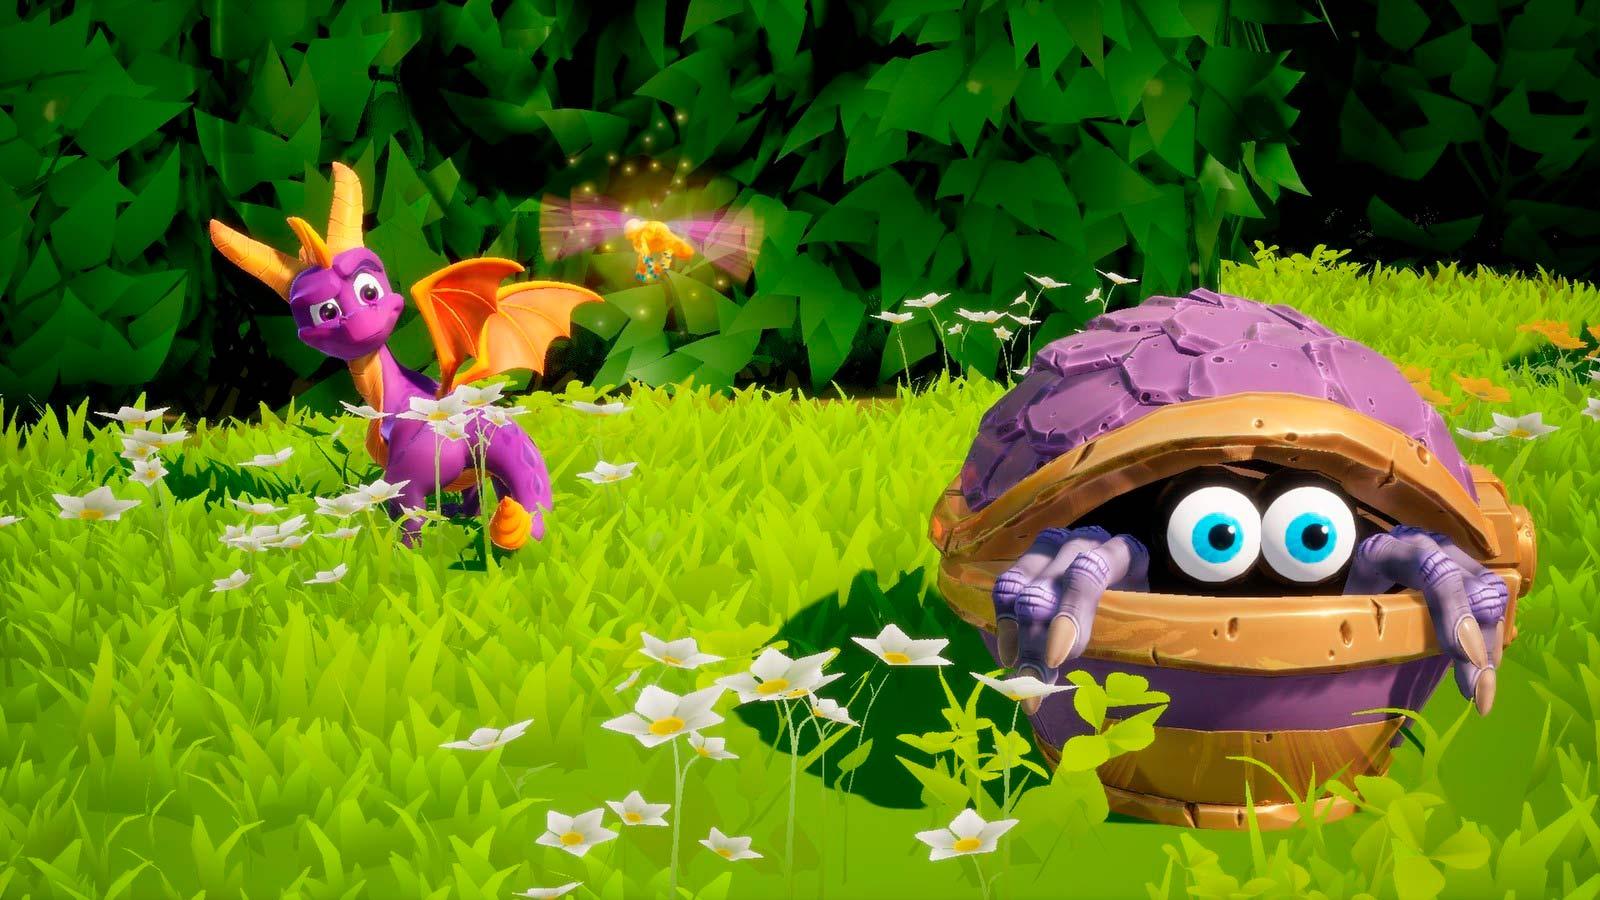 Impresiones de Spyro Reignited Trilogy en Xbox One X 2